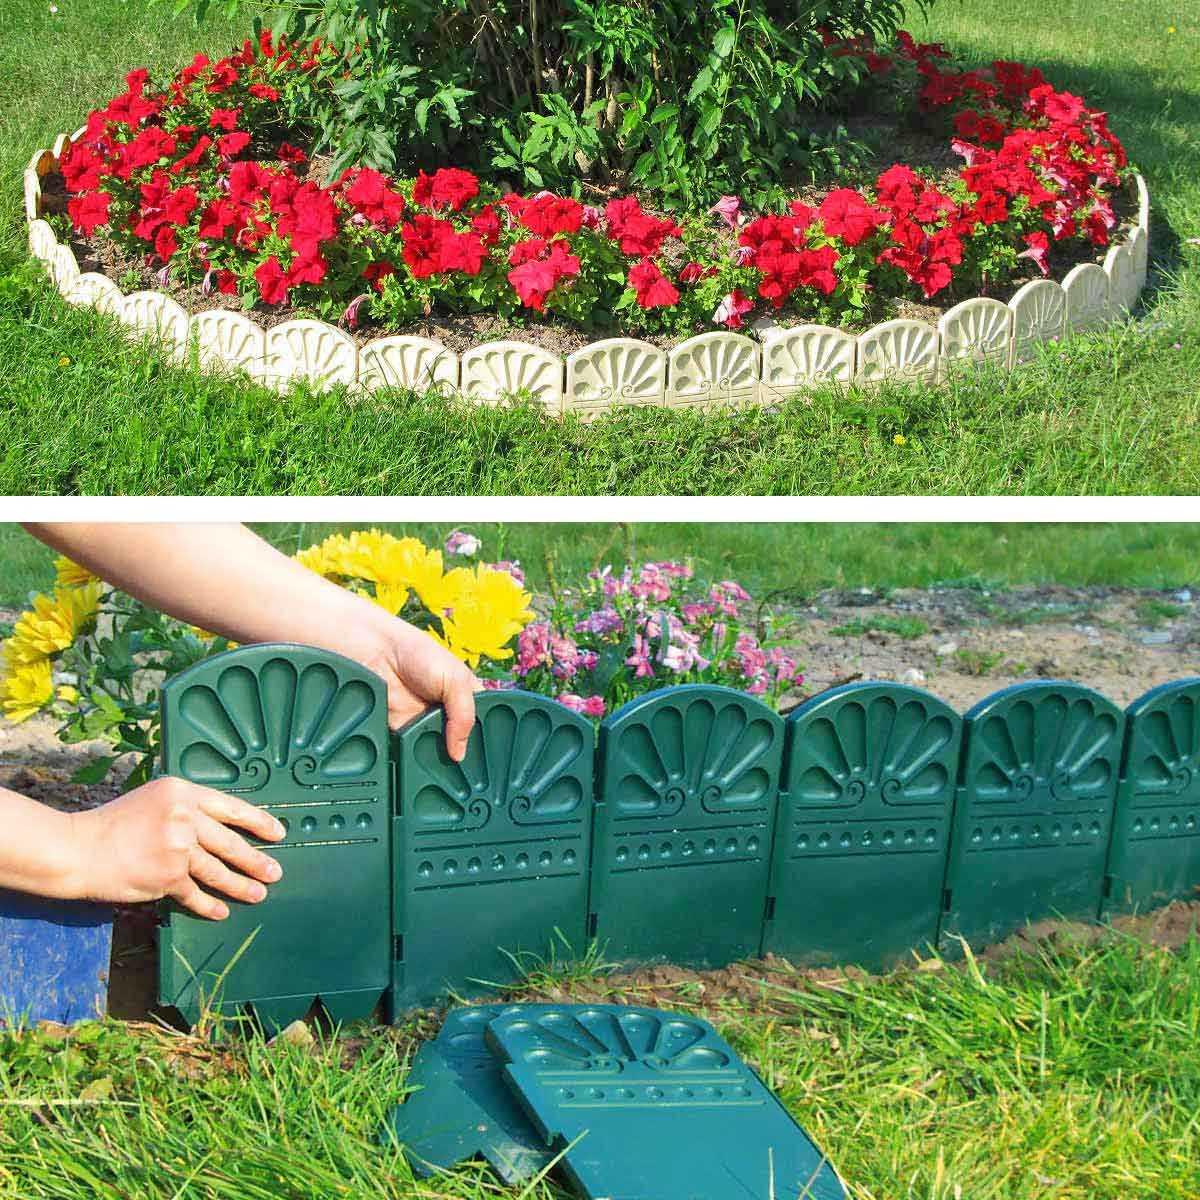 Bordures Décoratives De Jardin En Plastique concernant Bordure De Jardin En Pierre